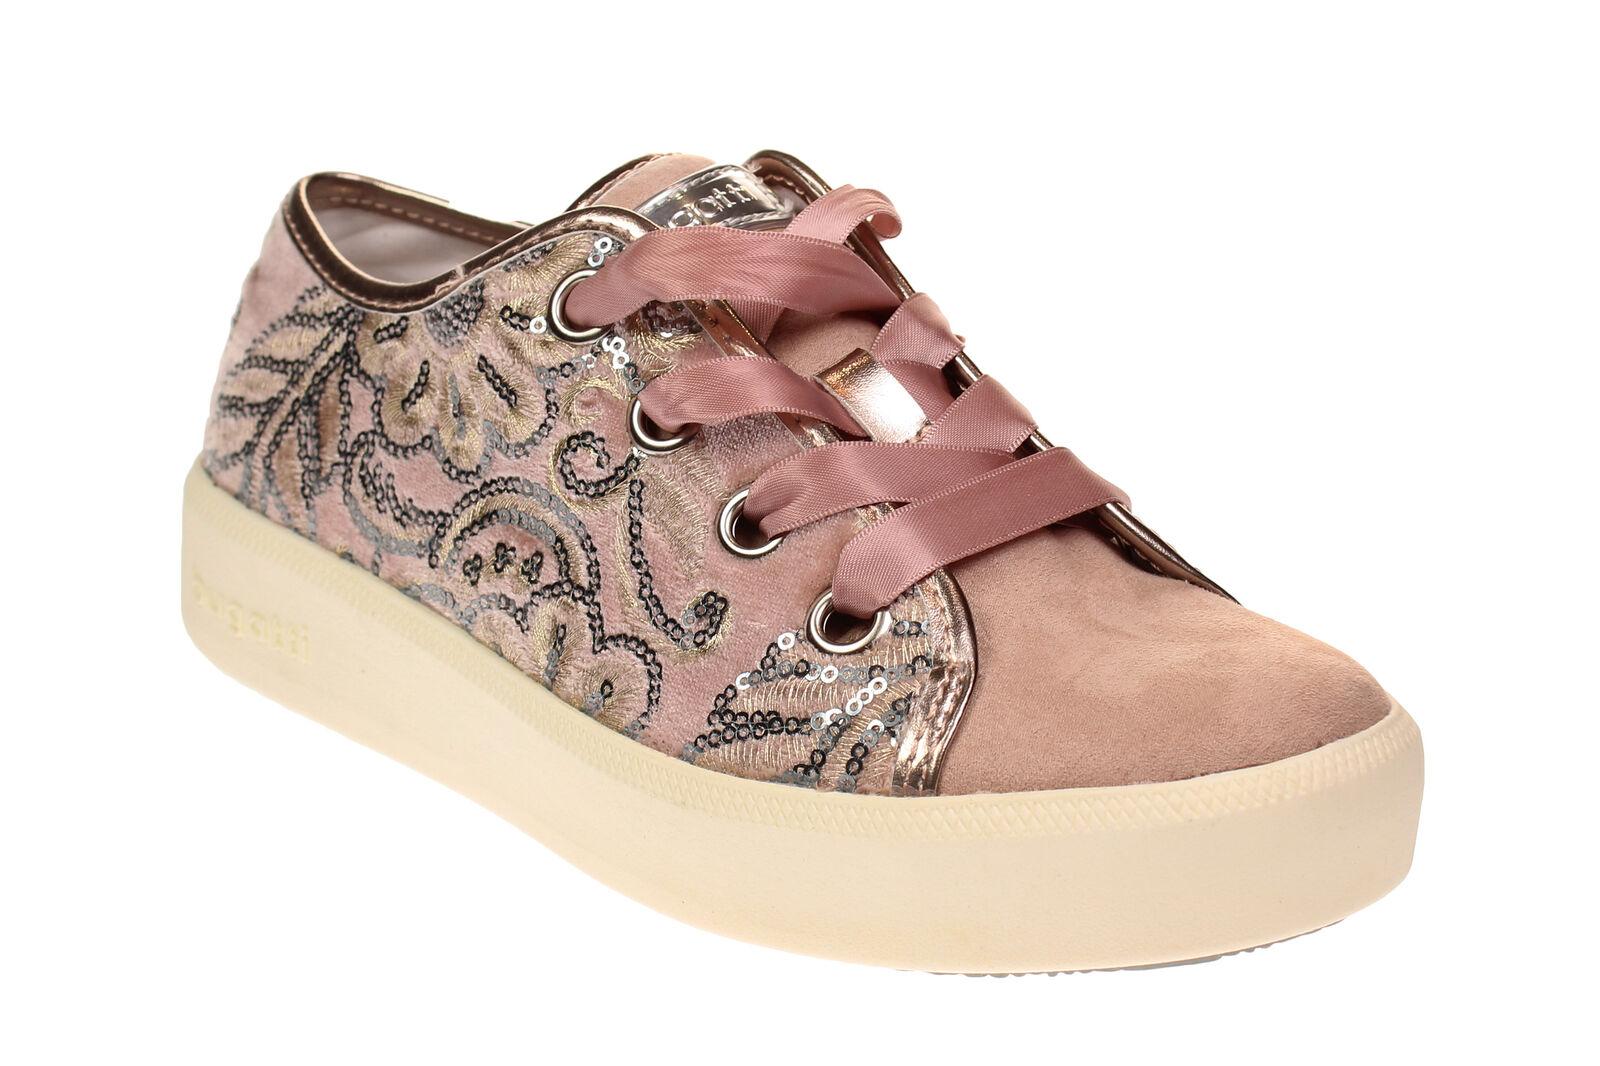 Bugatti kelli-señora zapatos zapatillas - 422 422 - 40706 6469 - 3490-Rose-Metallics d04aaf